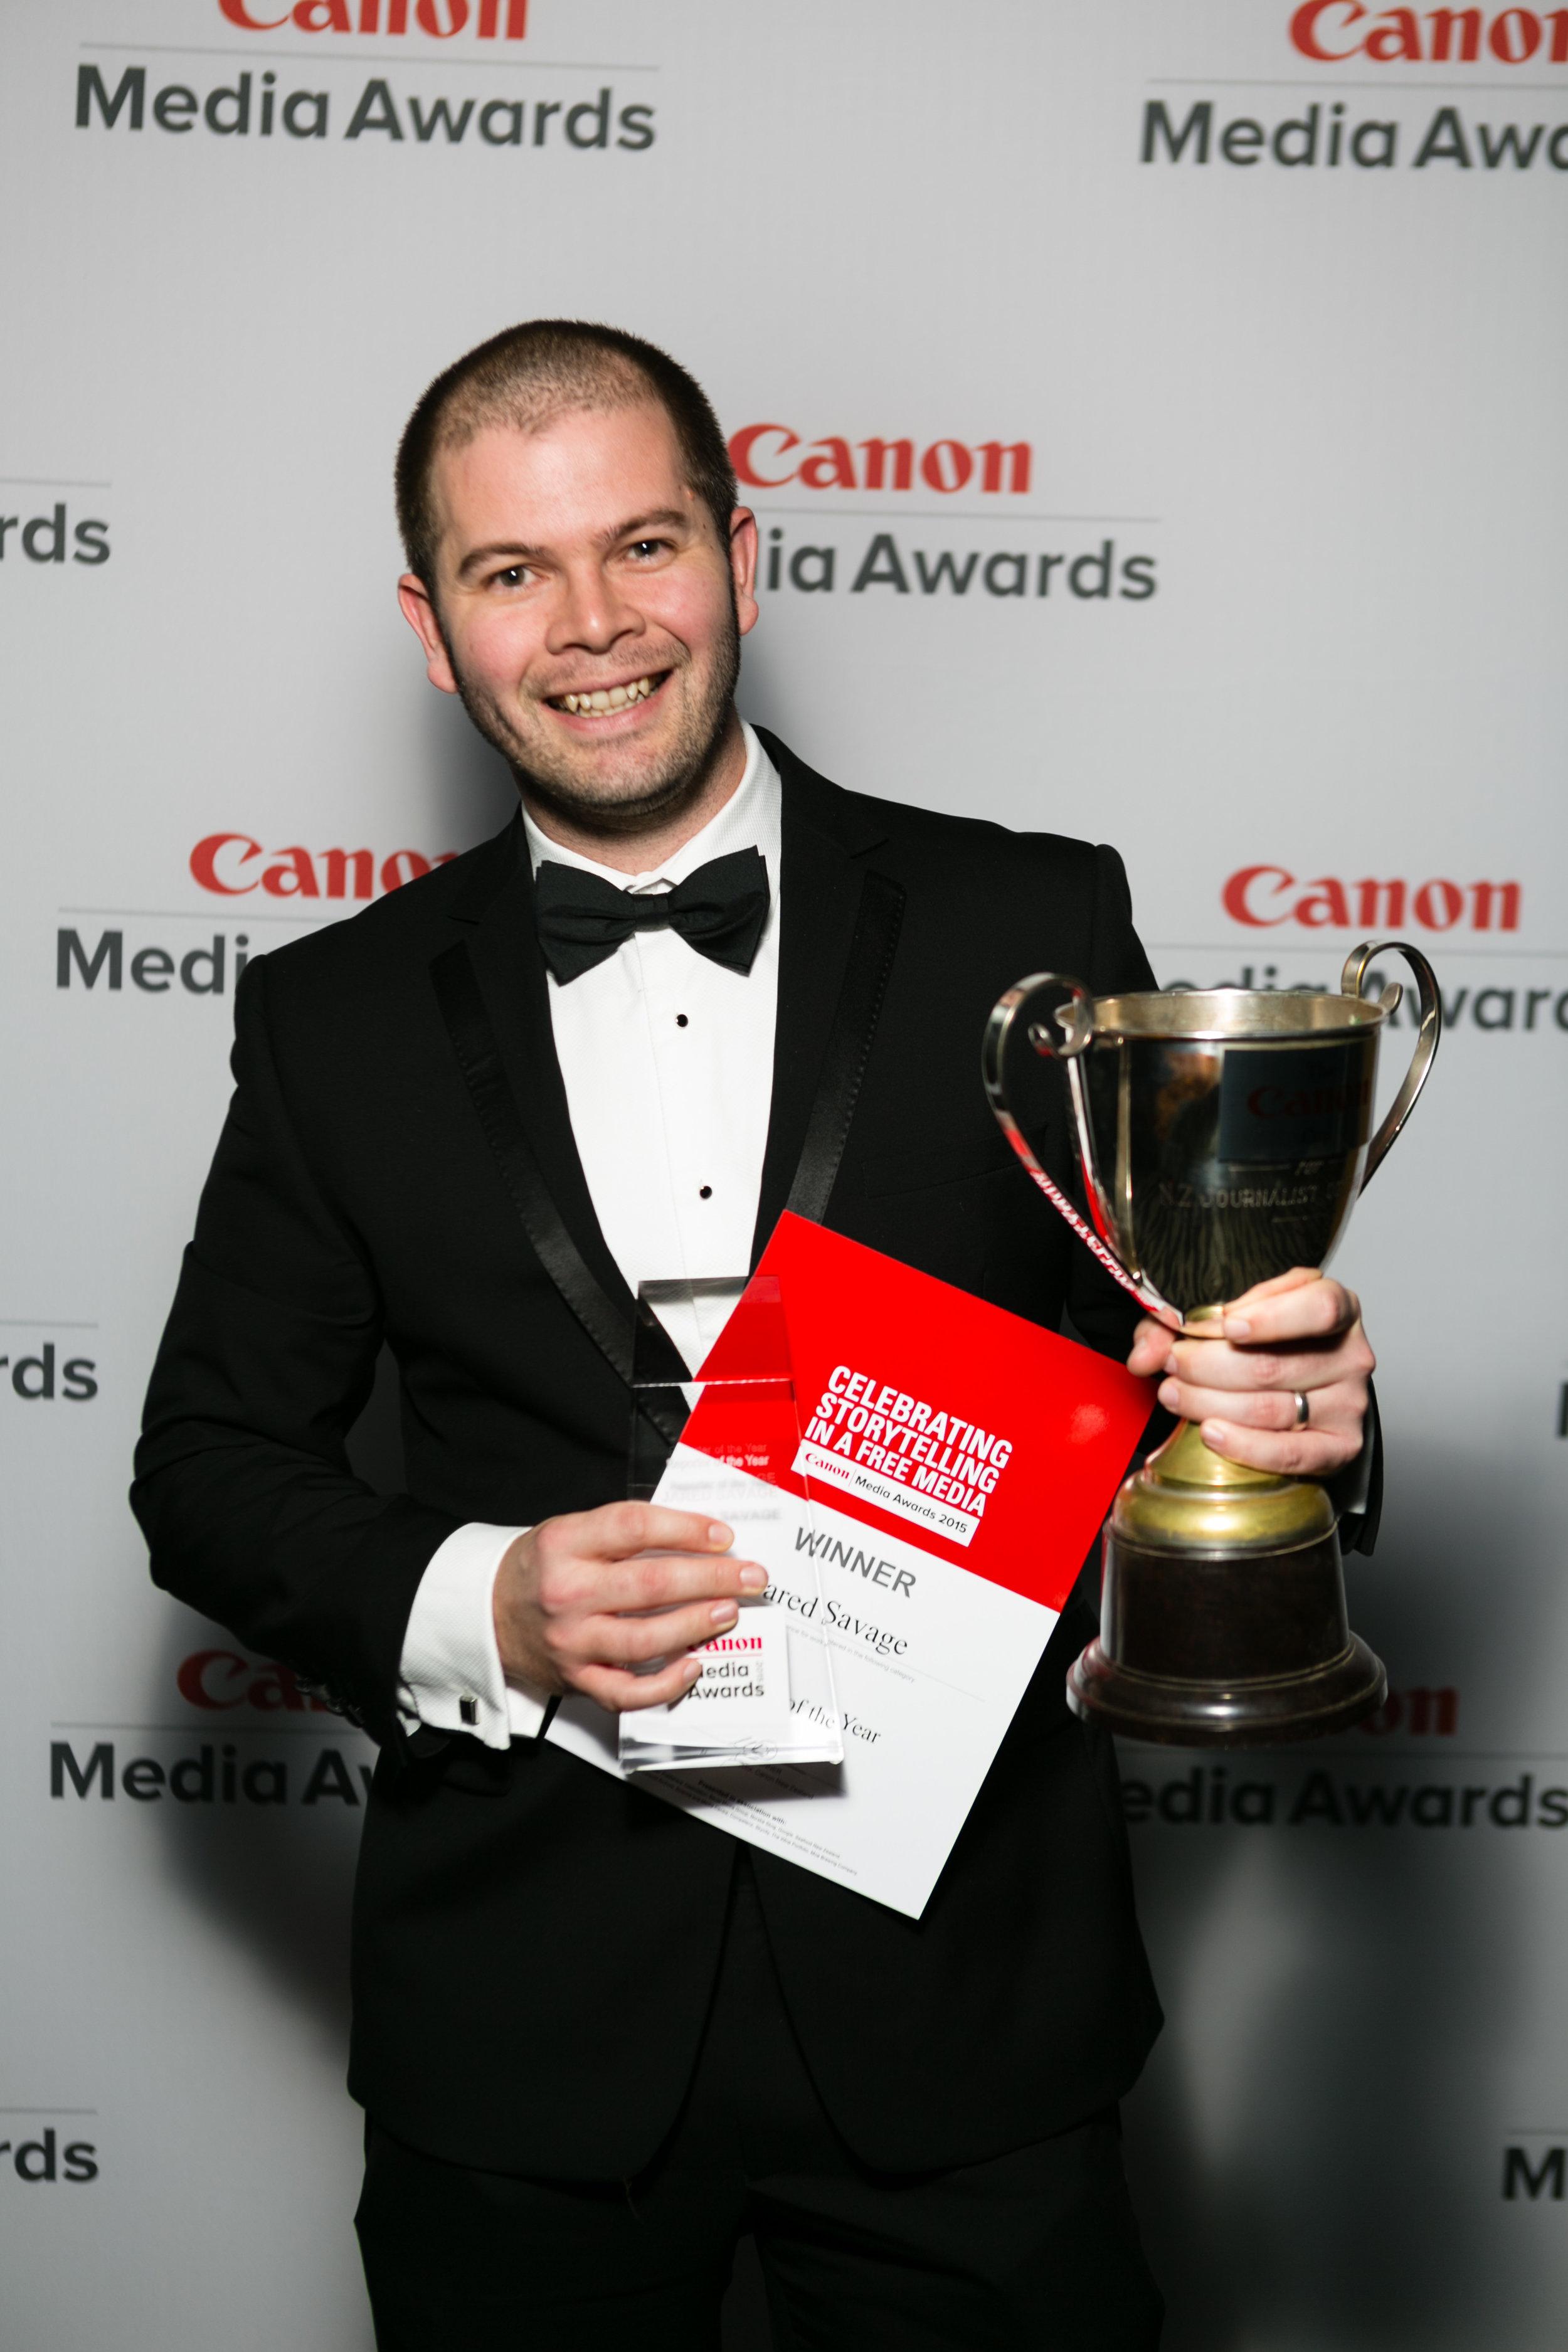 canon_media_awards_2015_interlike_nz_clinton_tudor-5948-197.jpg